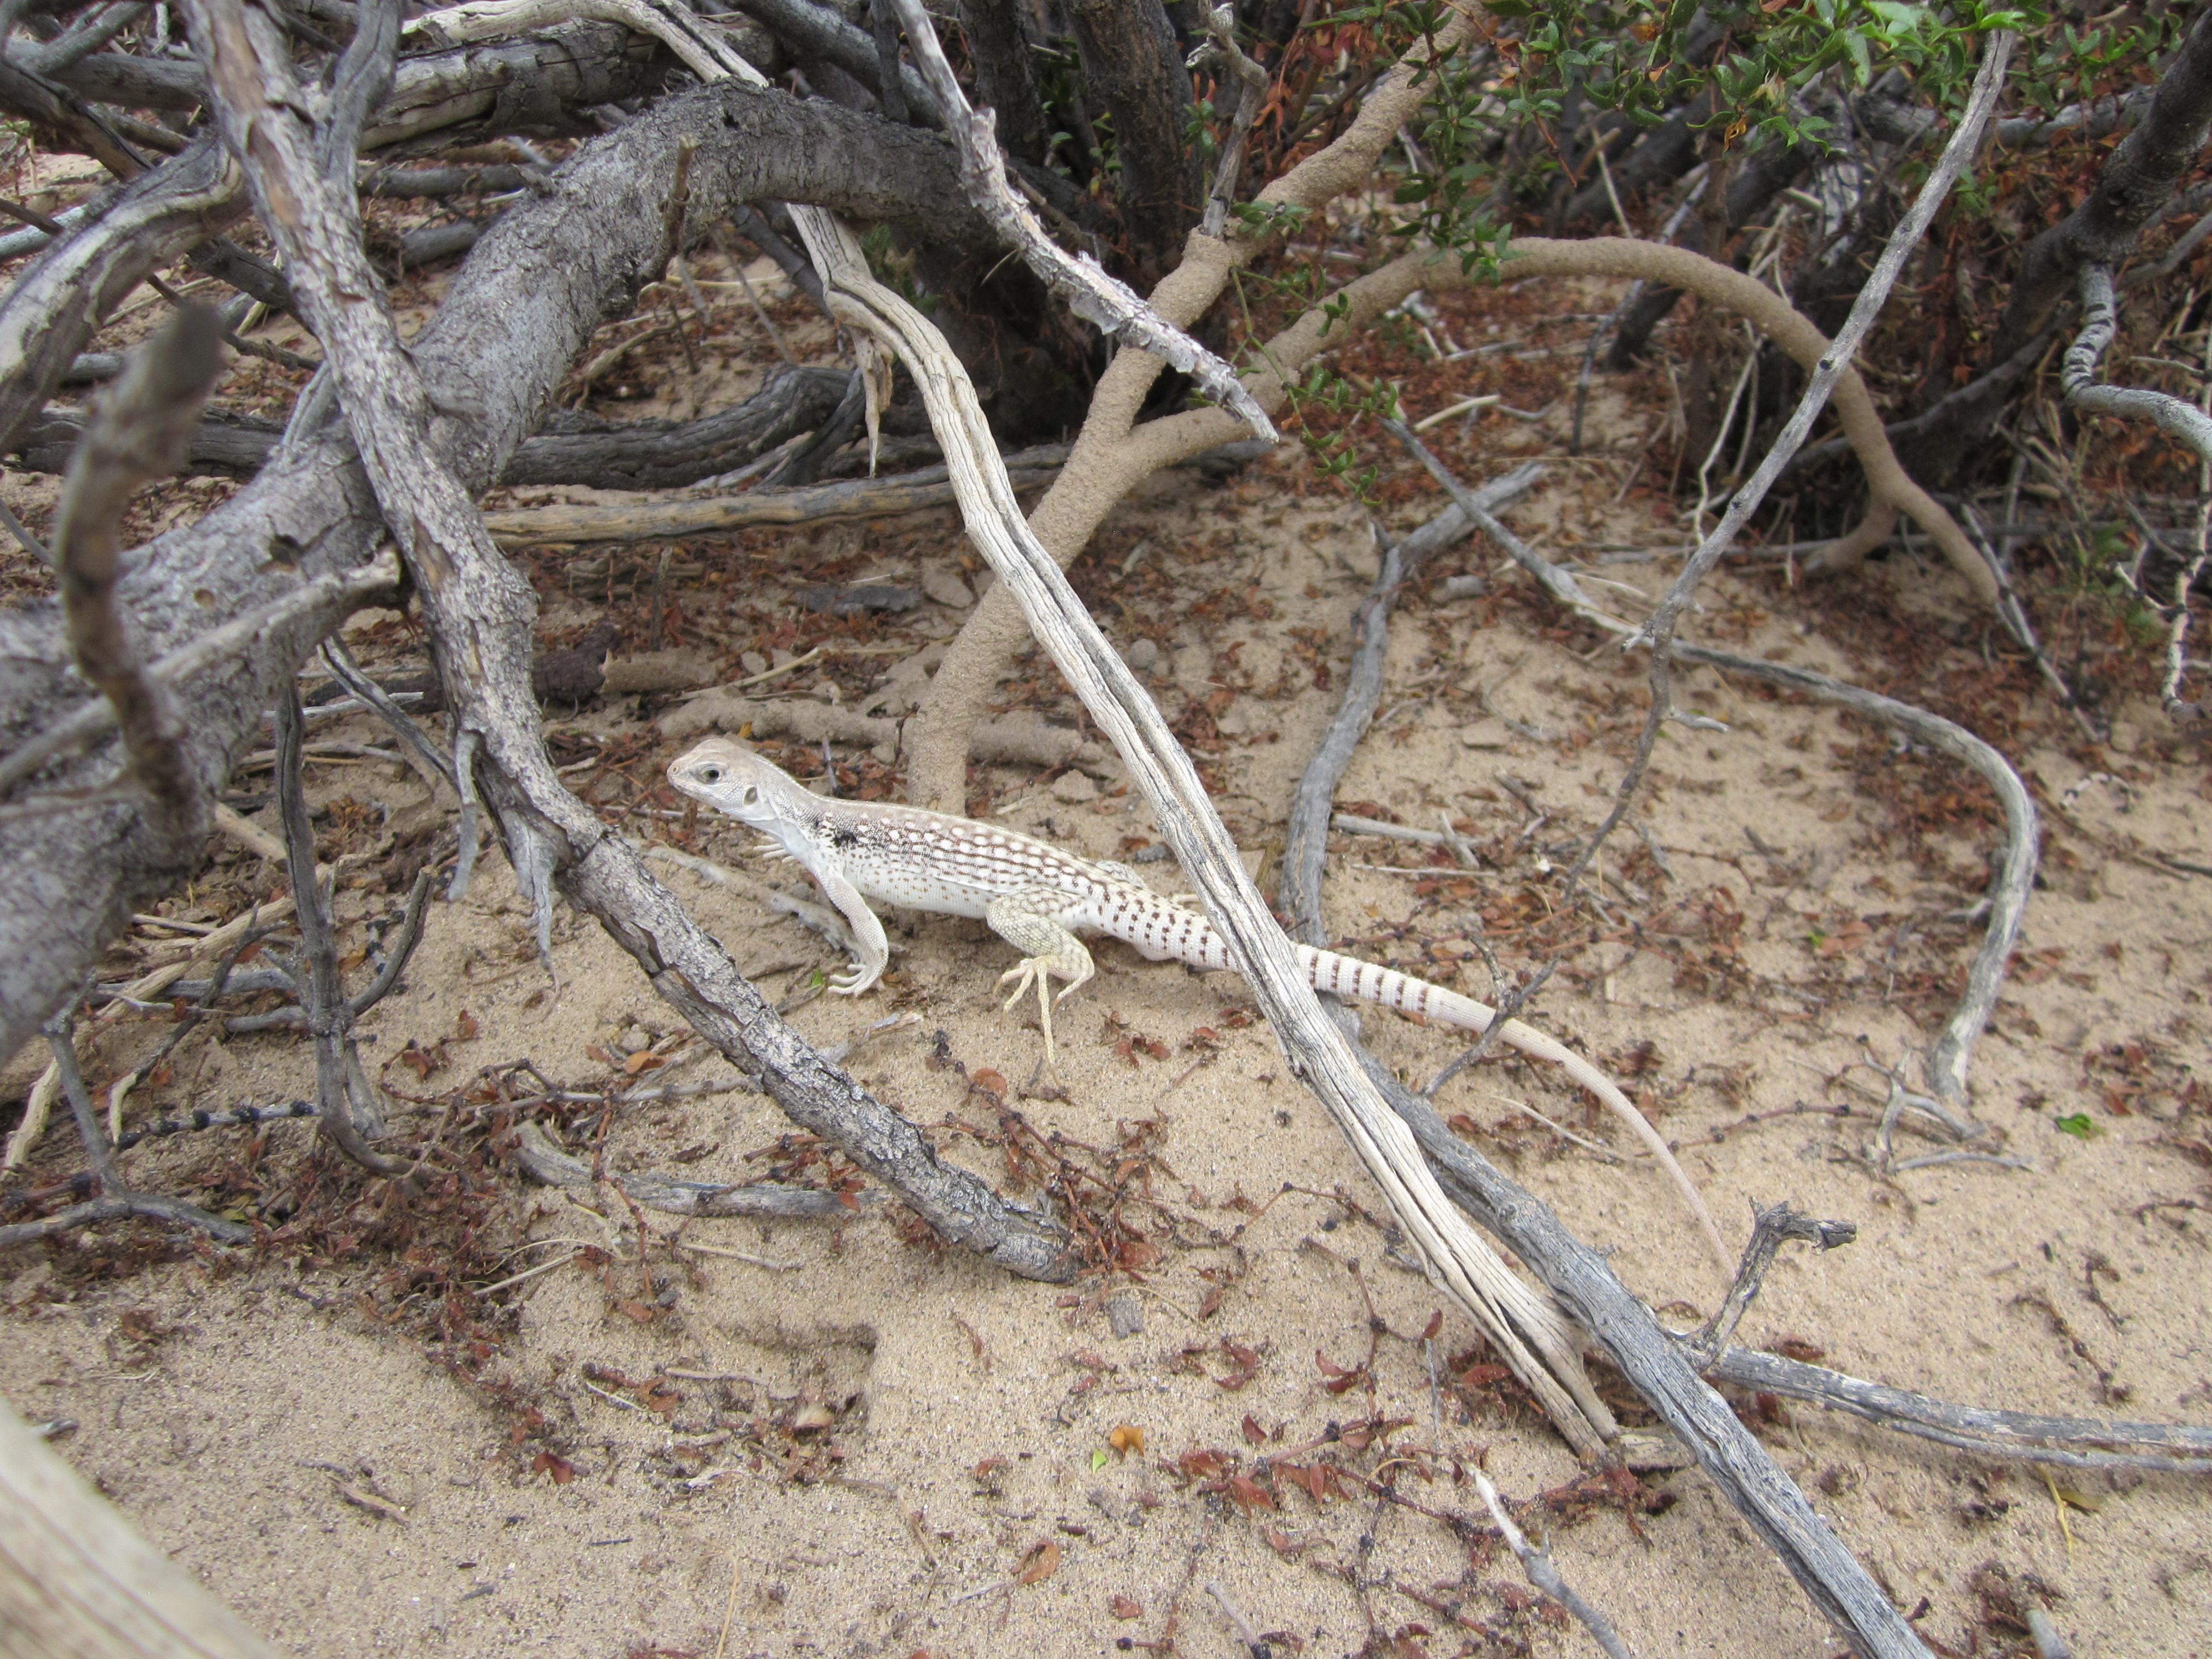 Northern desert iguana.